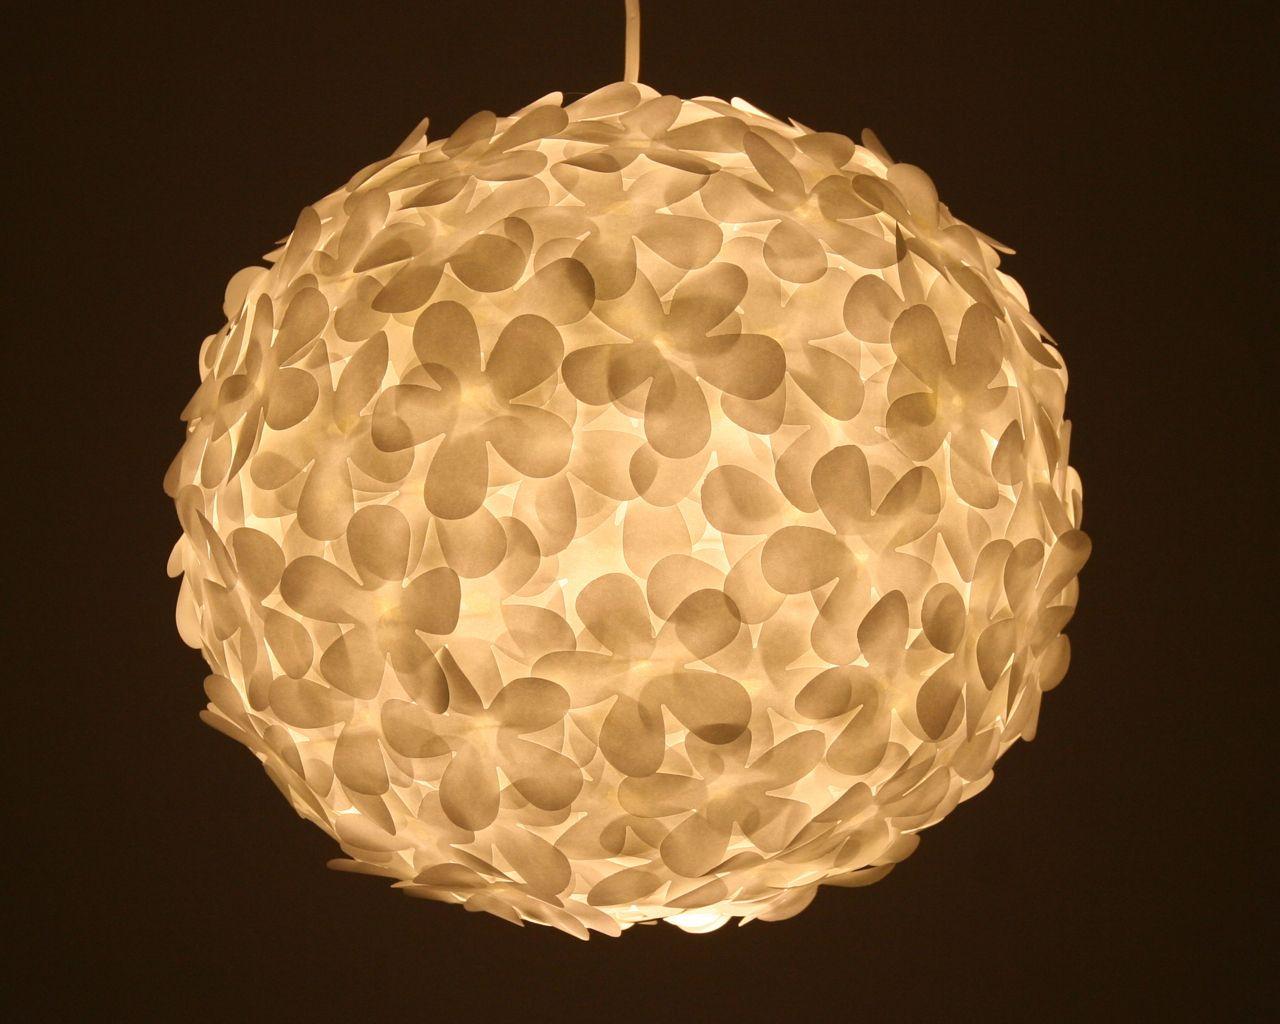 Uncategorized Paper Lantern Light Cord pin by bruna garrido on luz pinterest white paper lights and lamp lampspaper lanternspaper